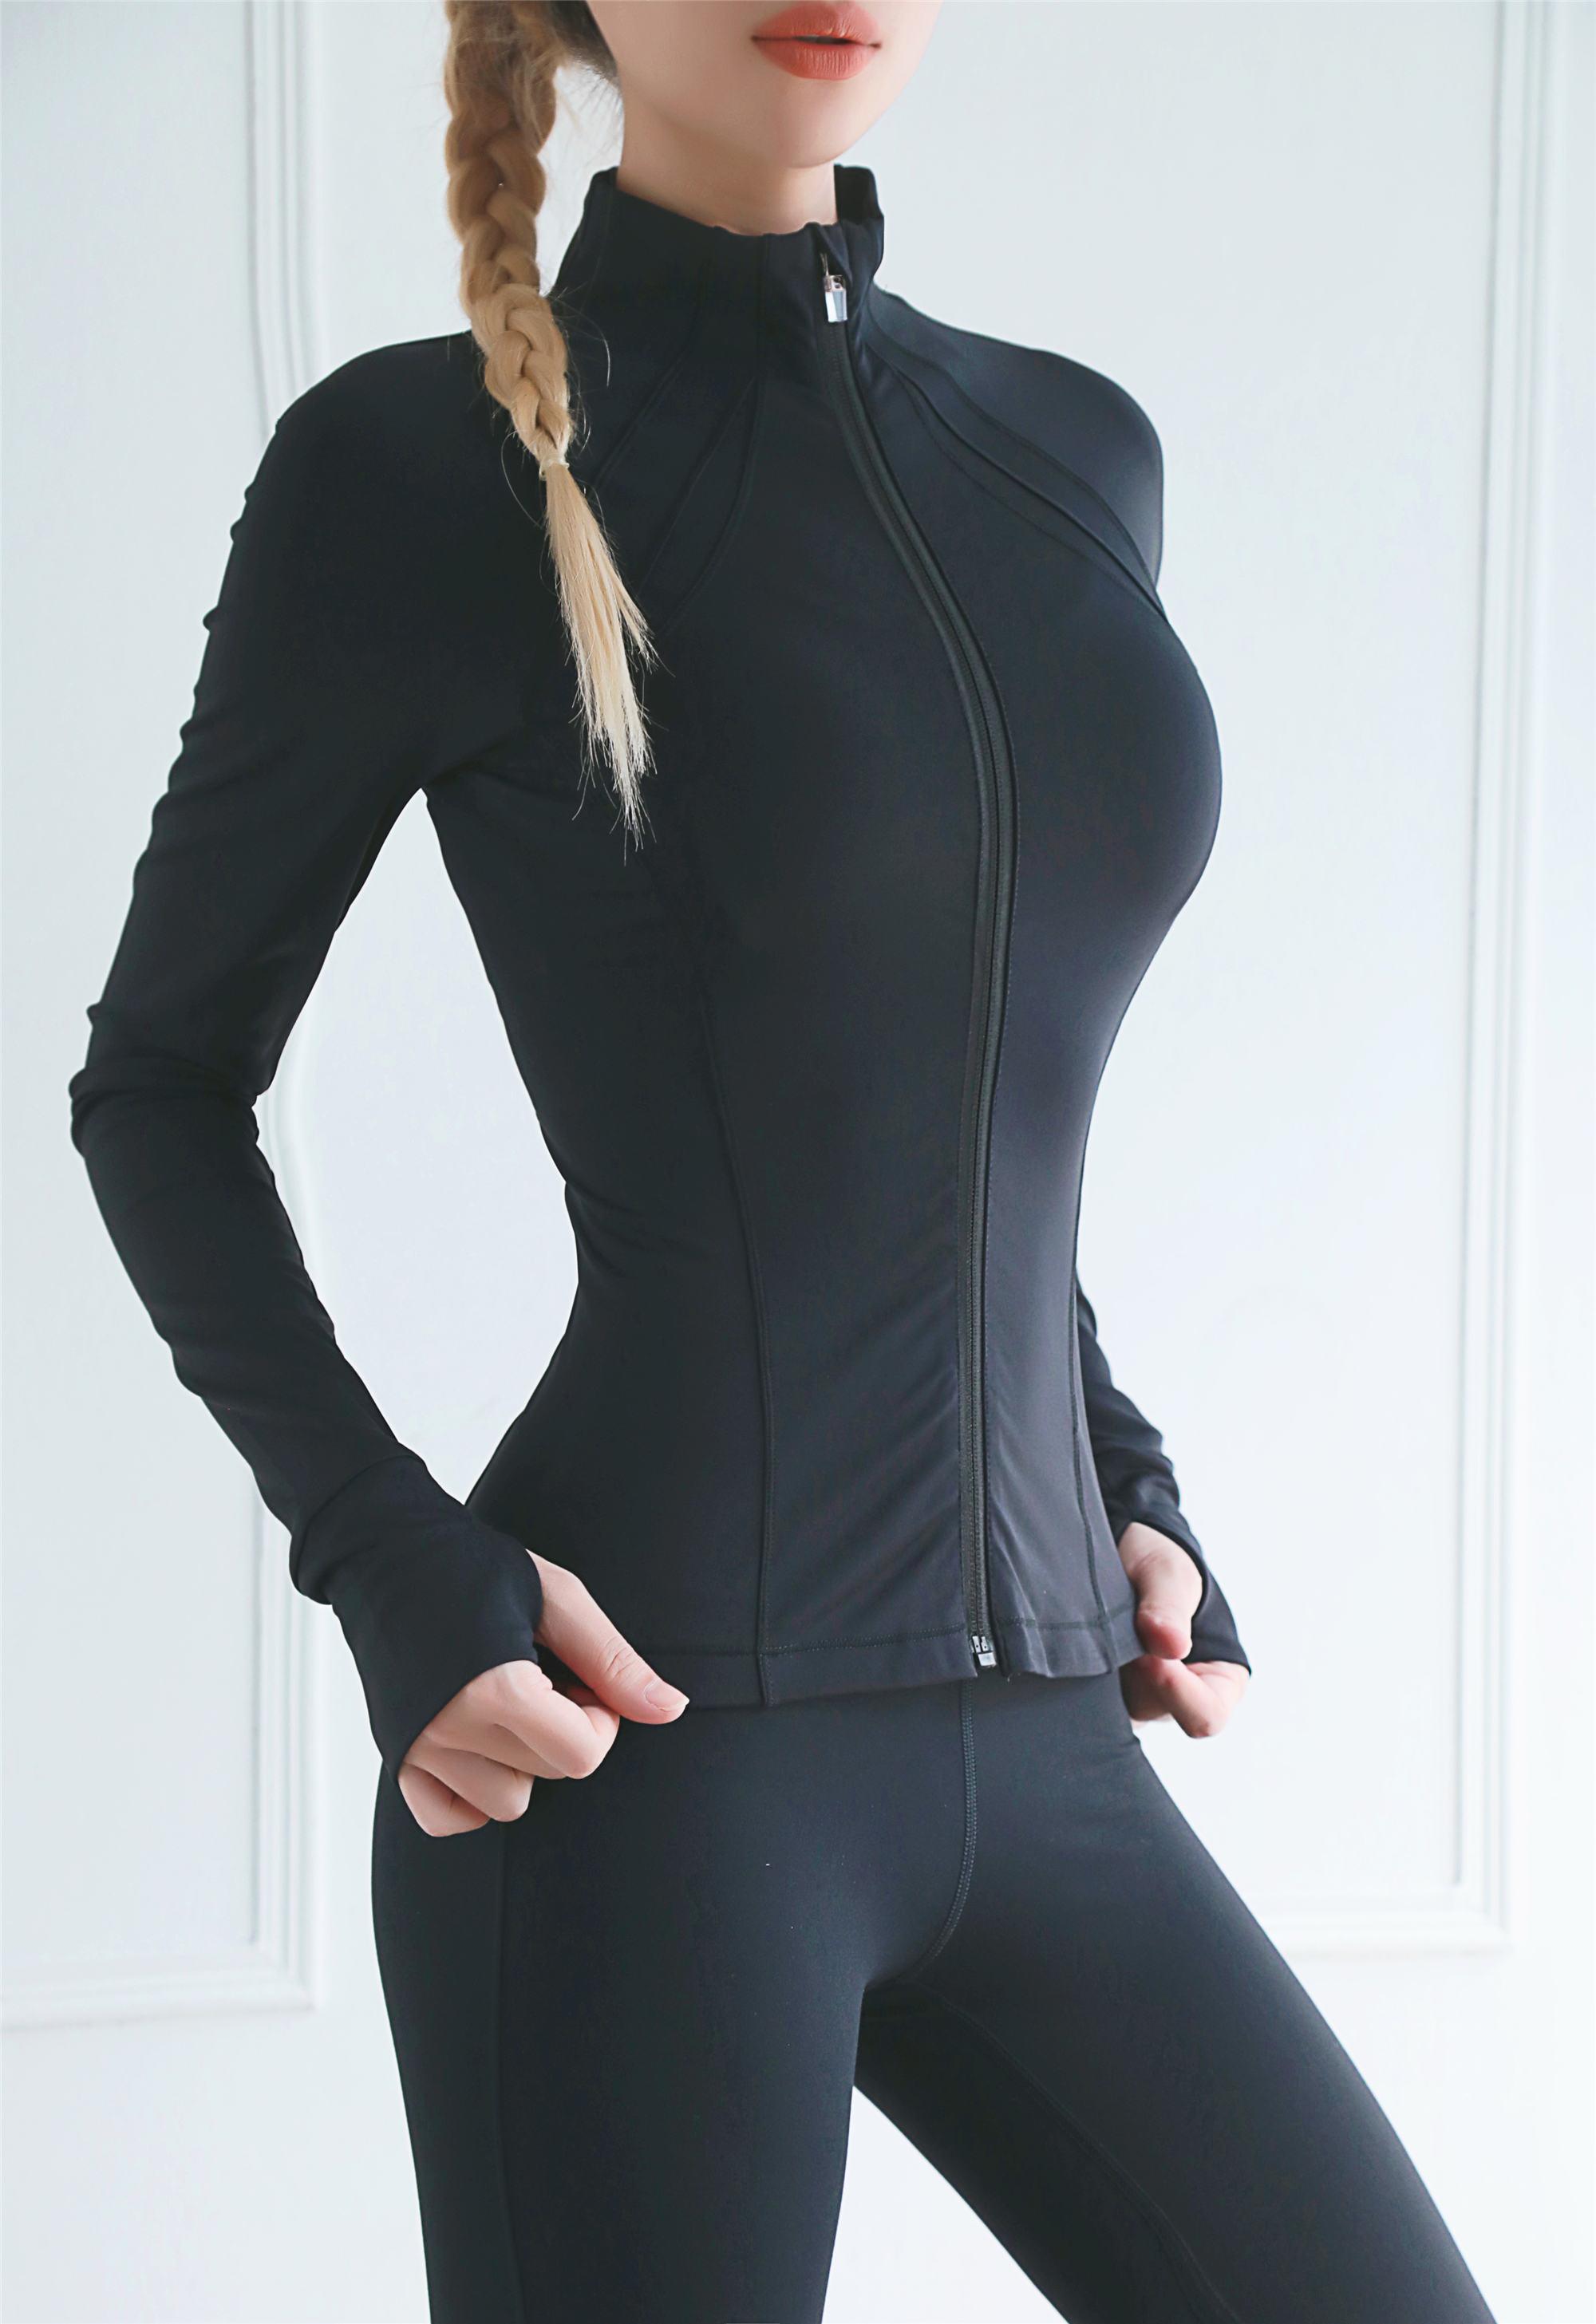 Women Jacket With Zipper 12